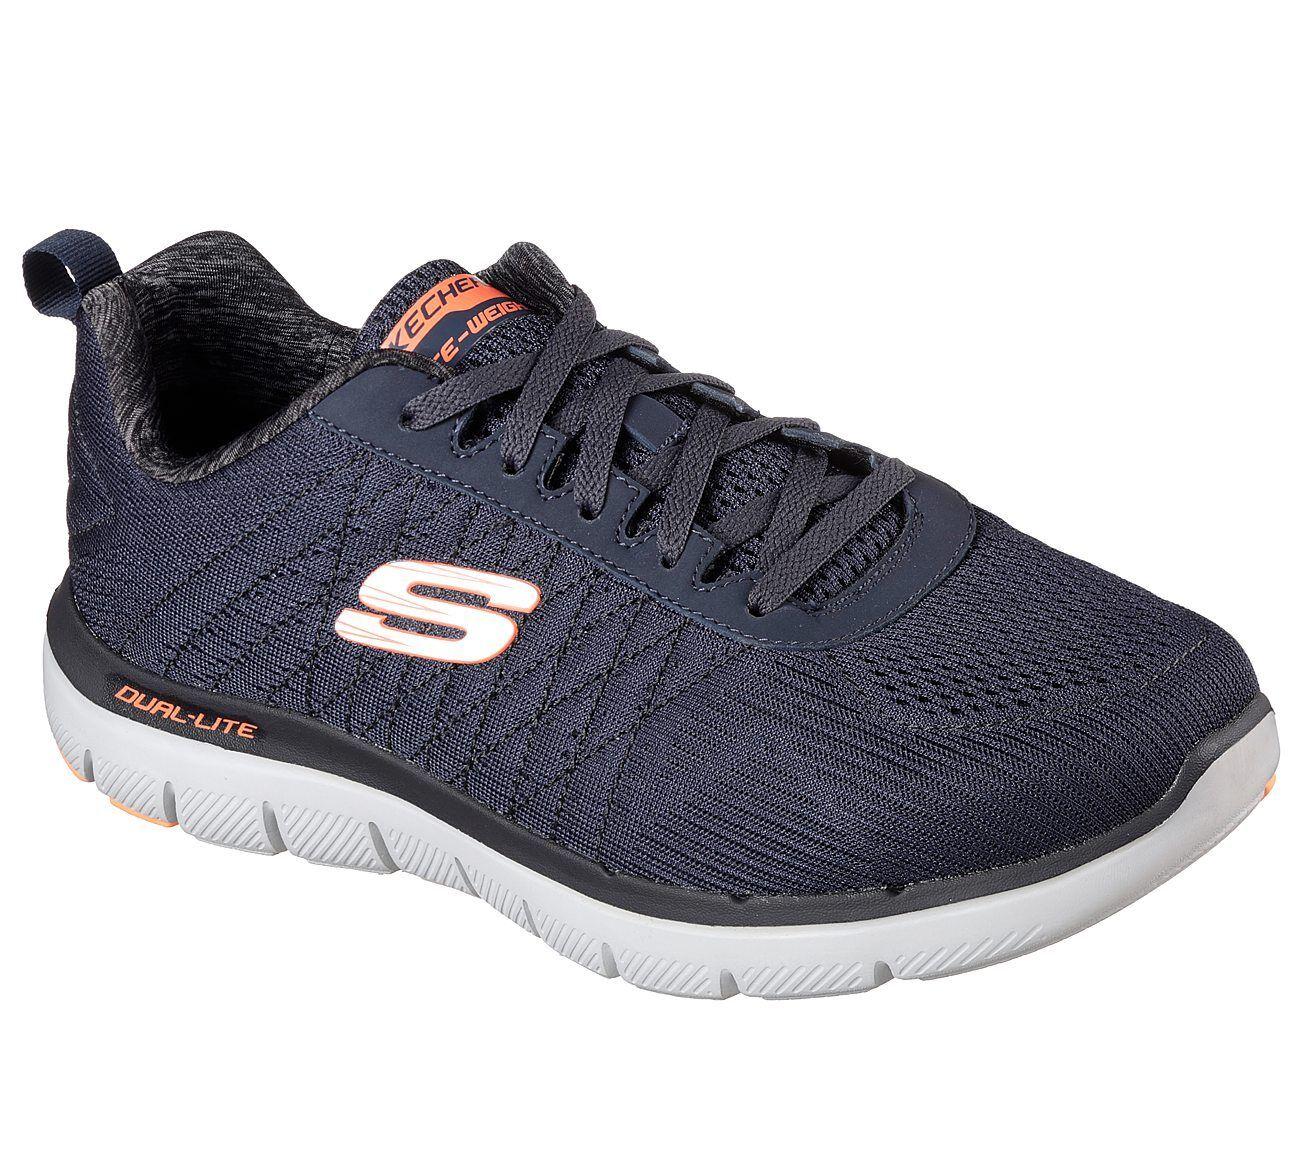 Skechers Flex Flex Skechers Advantage 2.0 - The Happs Running/Walking Trainers - Navy a192d6